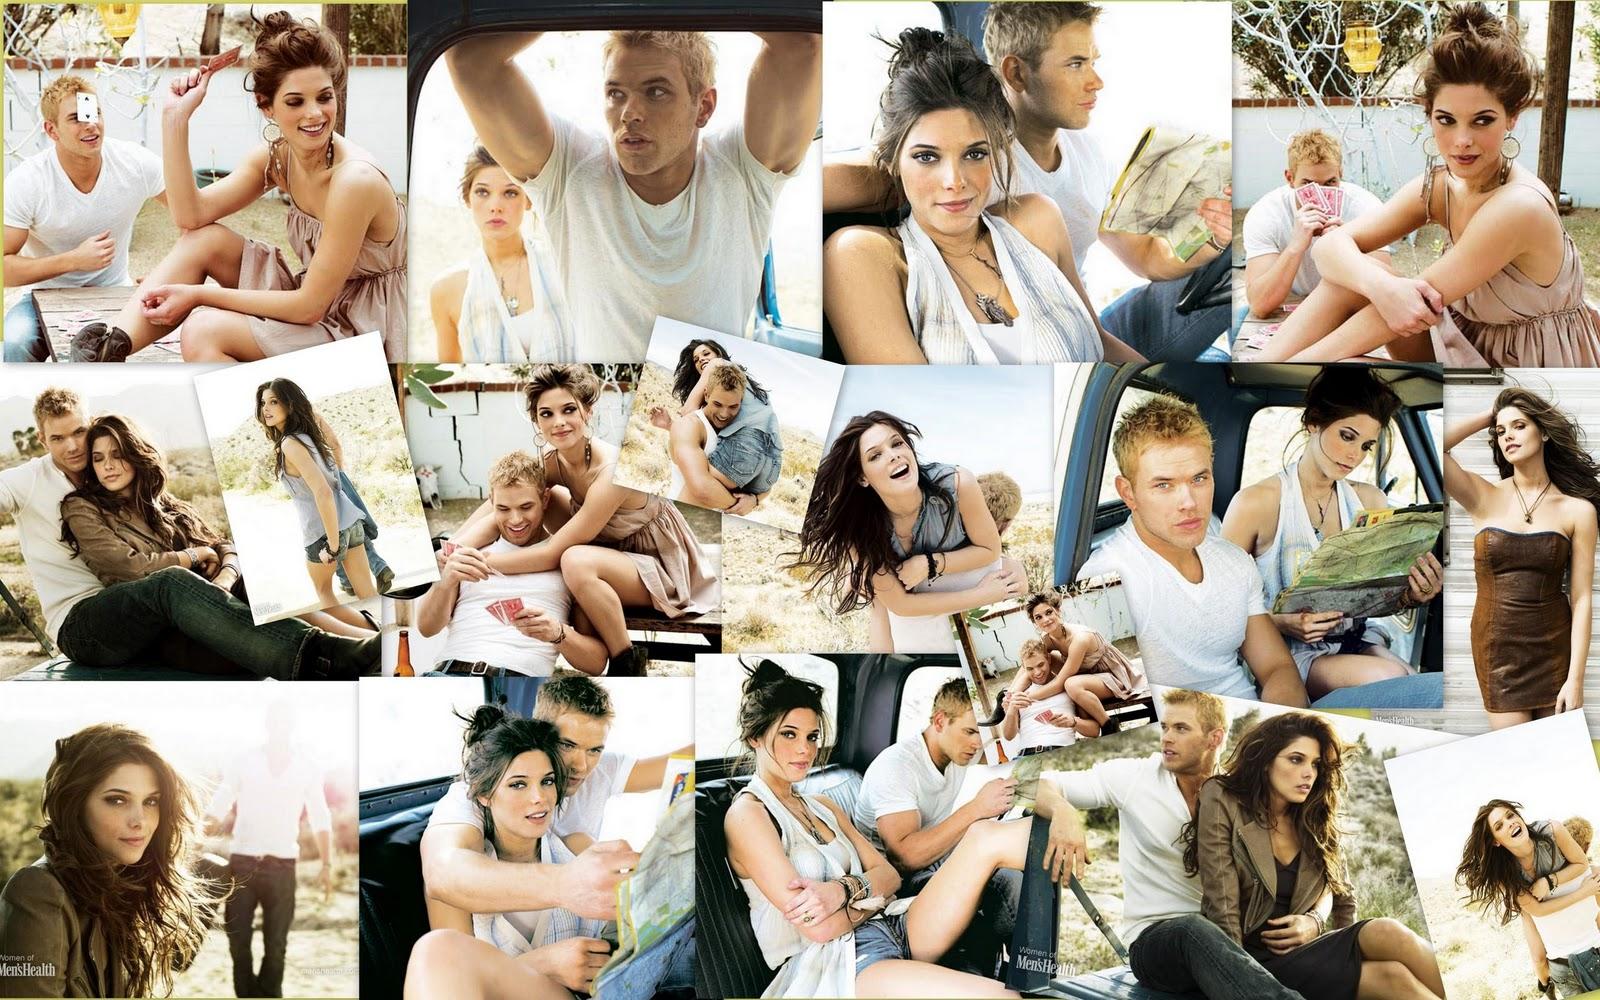 http://2.bp.blogspot.com/-pDk2yT-VvFk/TqLllw30LeI/AAAAAAAAAb0/-tu2YIym9KY/s1600/Ashley+Greene+Kellan+Lutz+01.jpg